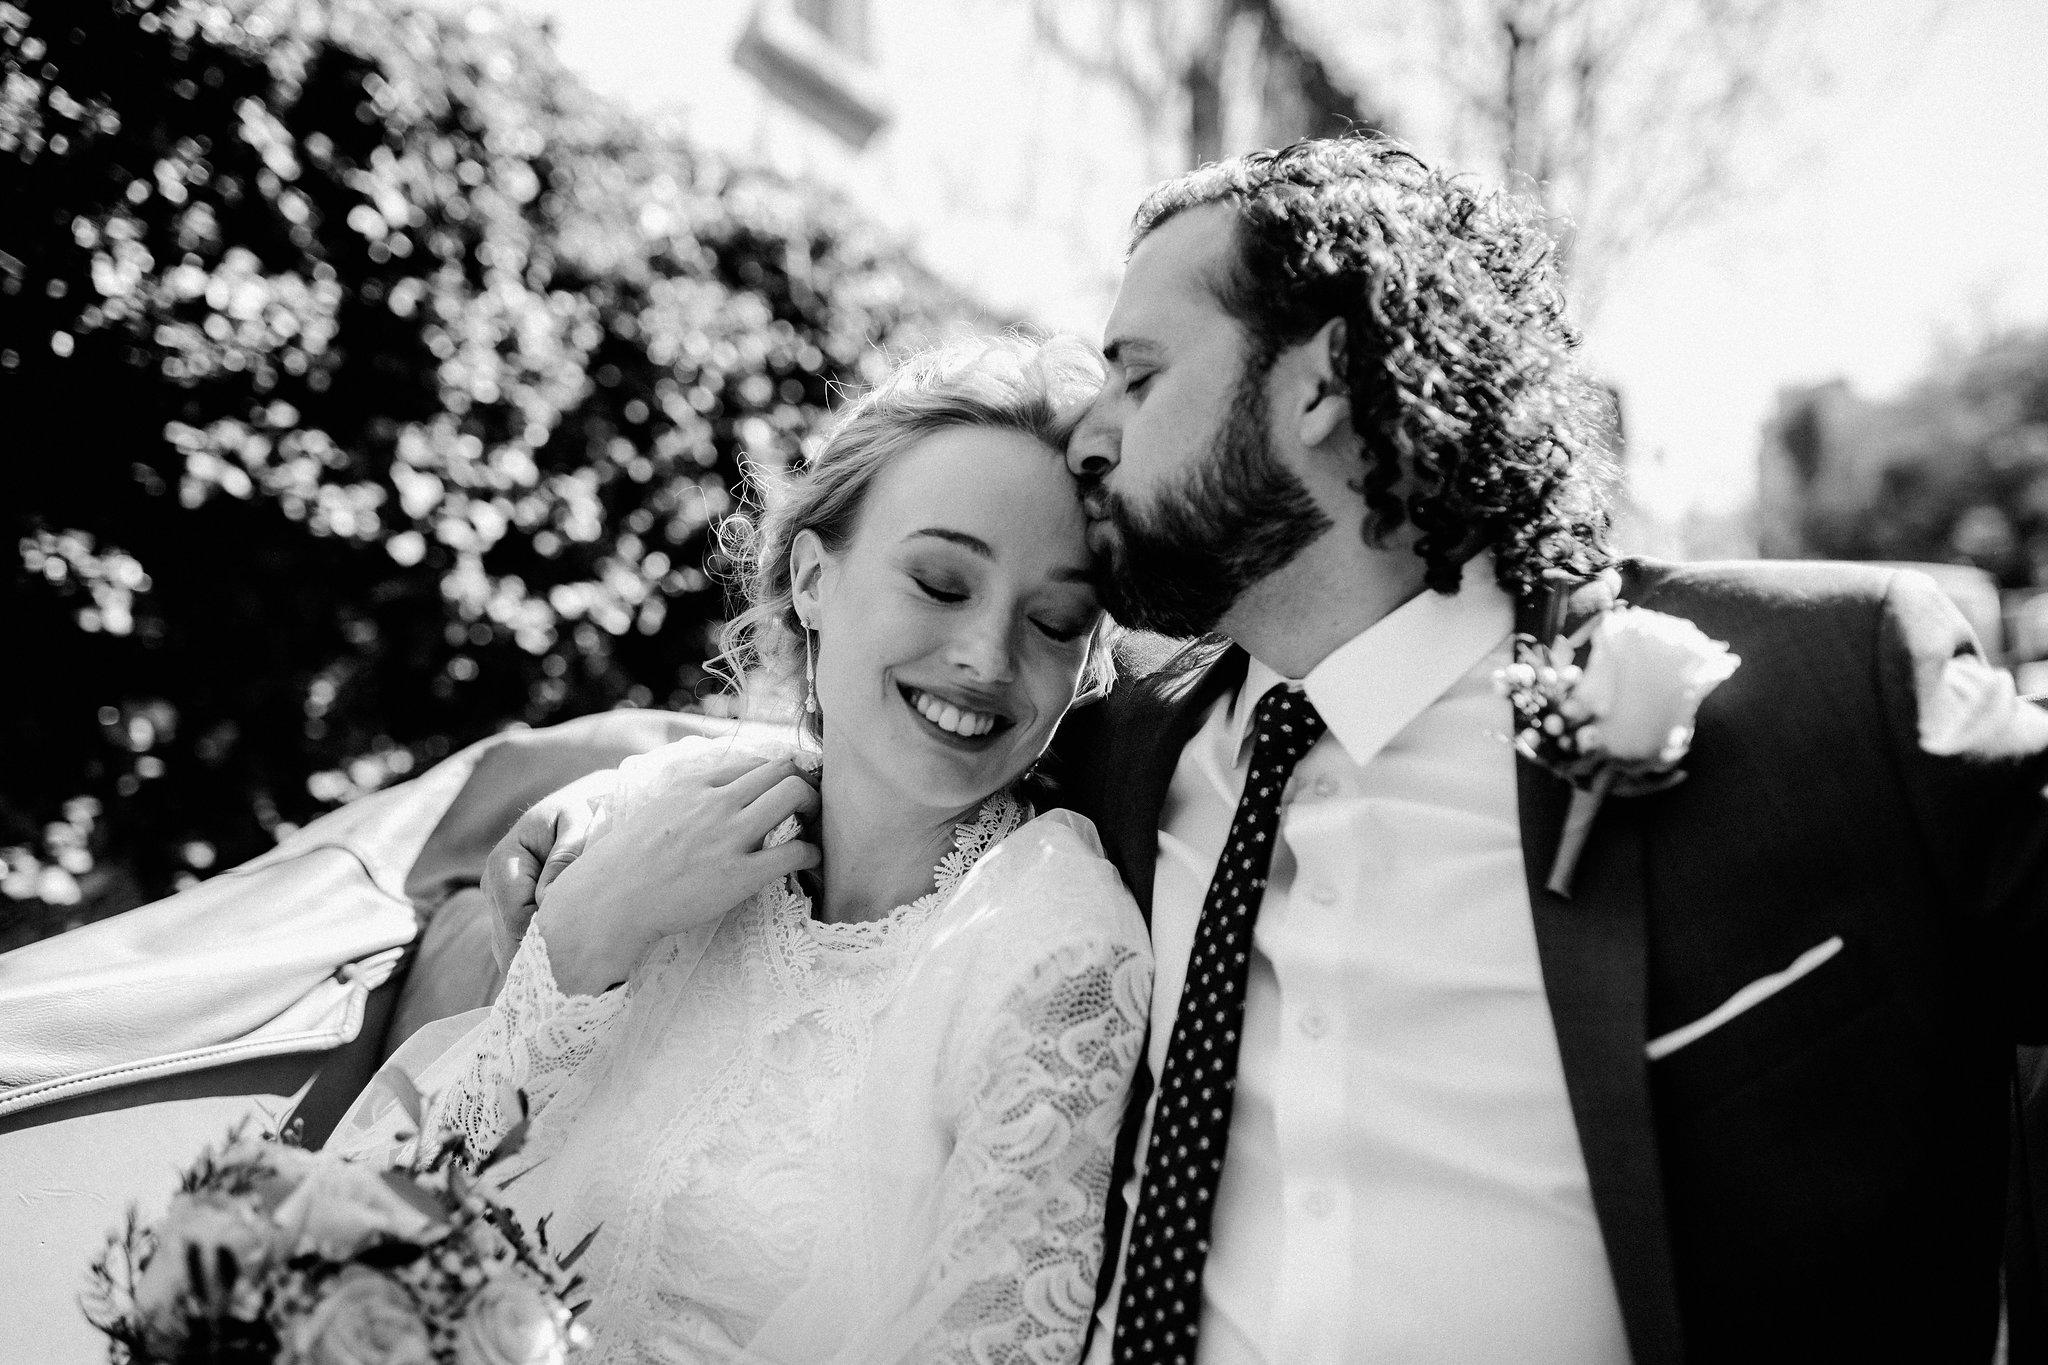 Paris_elopement_wedding_photographer-239.jpg